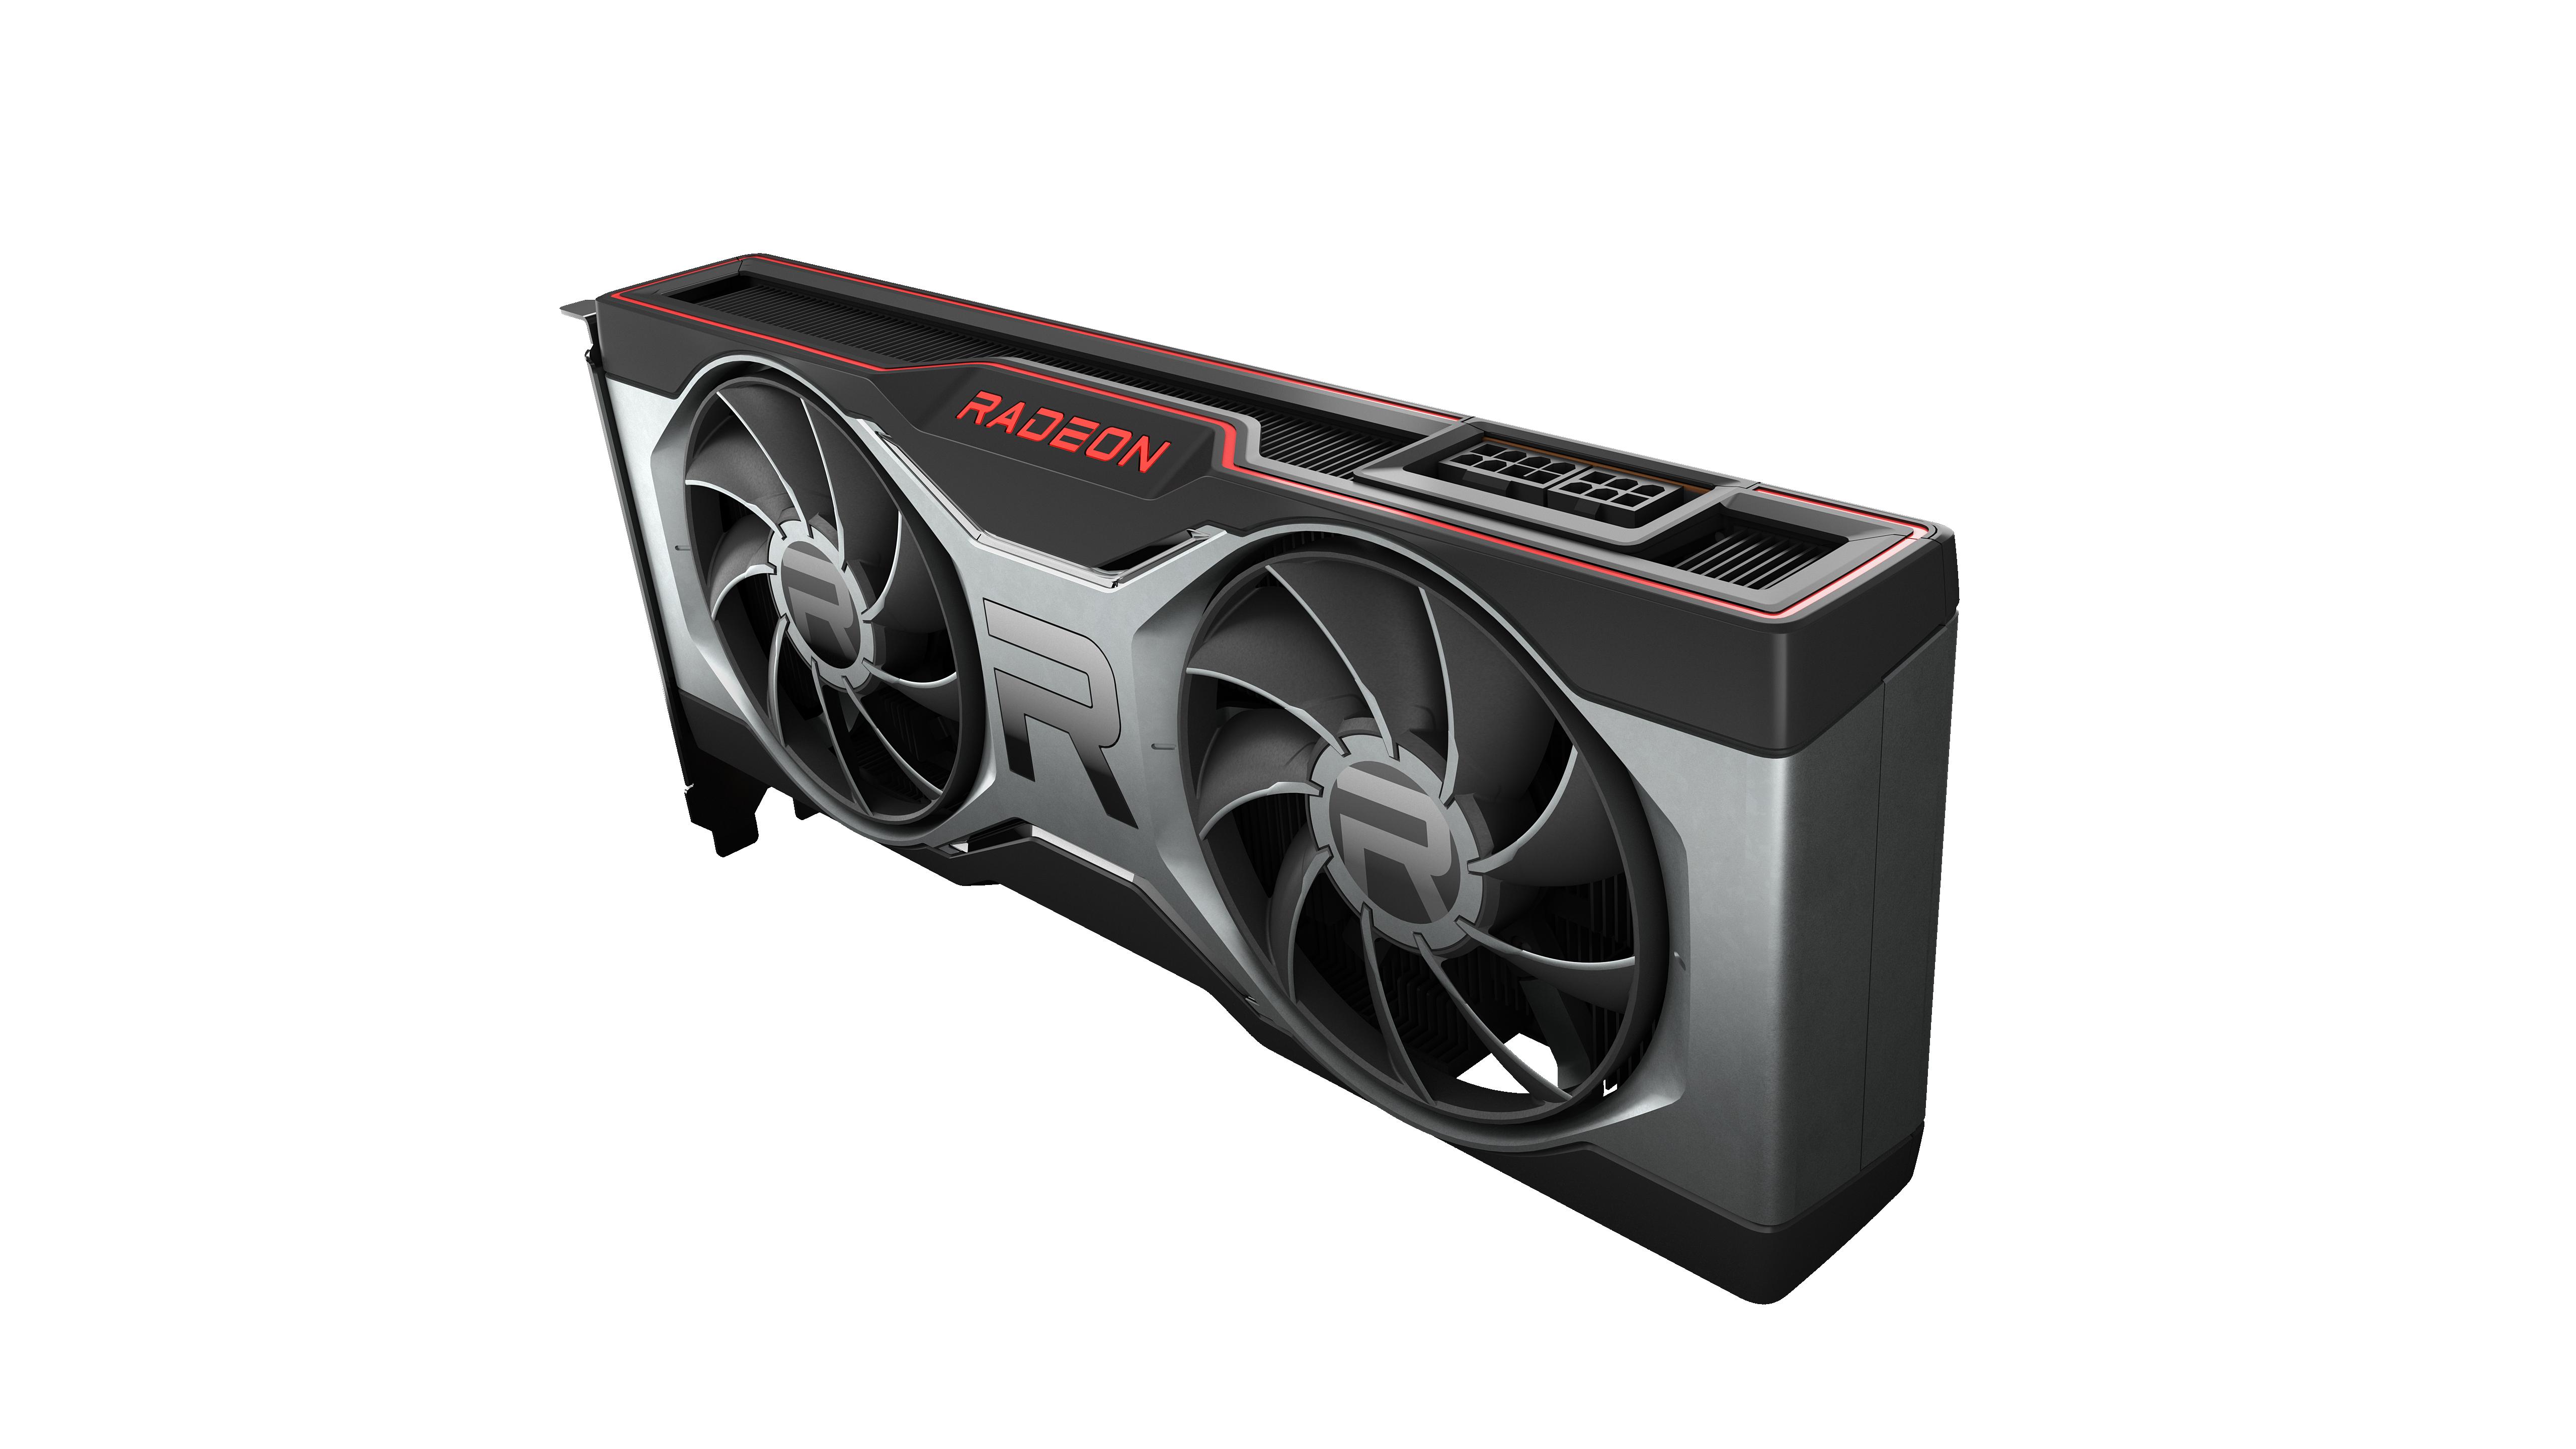 Radeon RX 6700 XT image